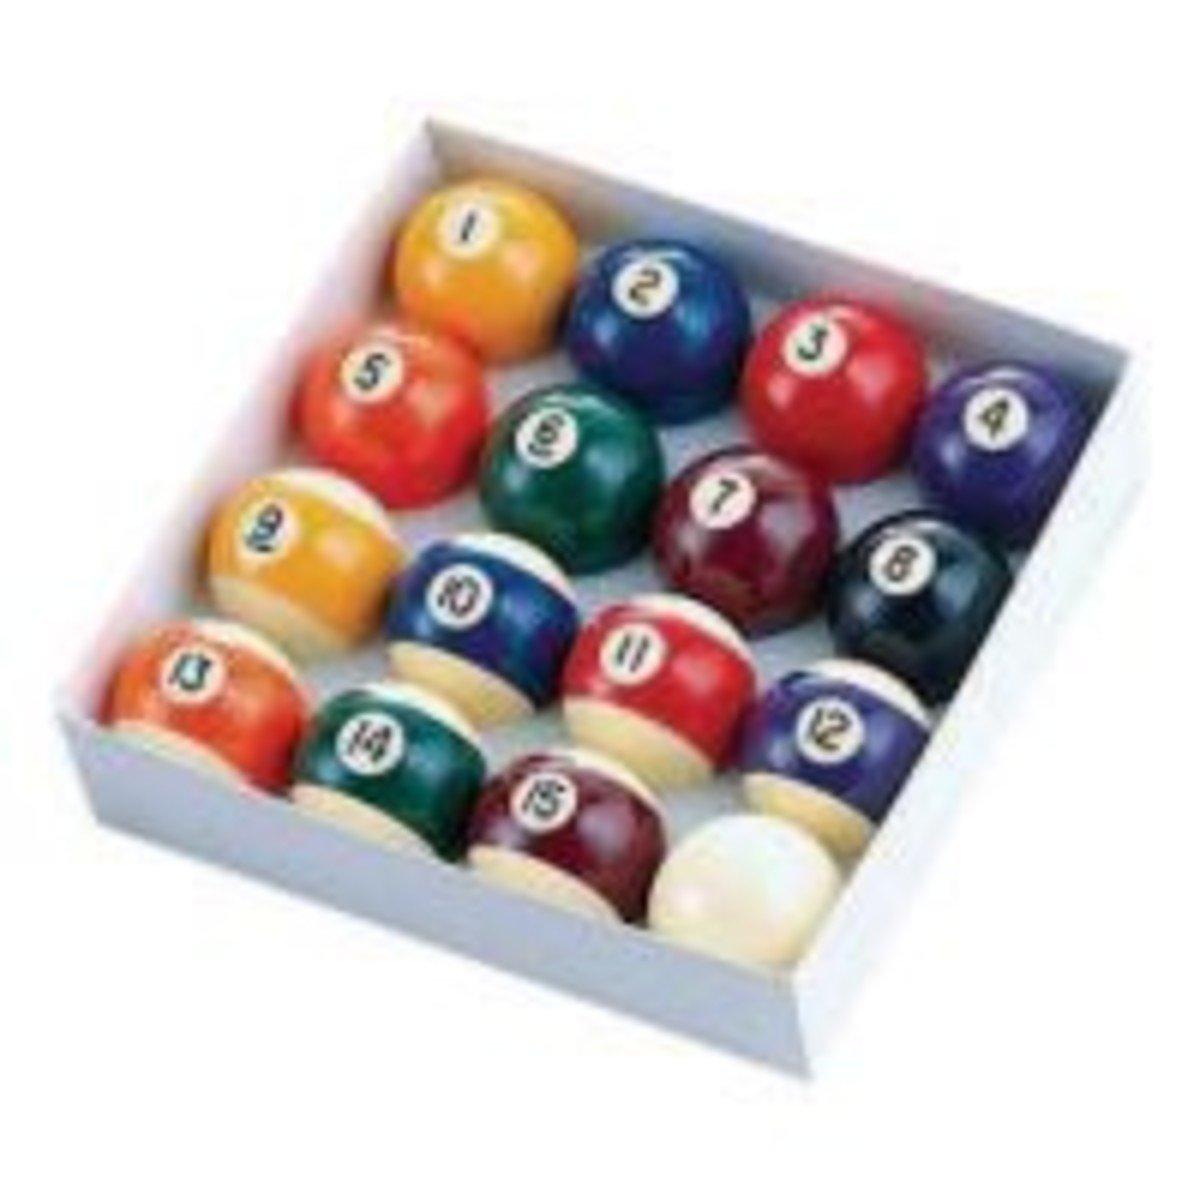 Regulationビリヤードボールのセット16